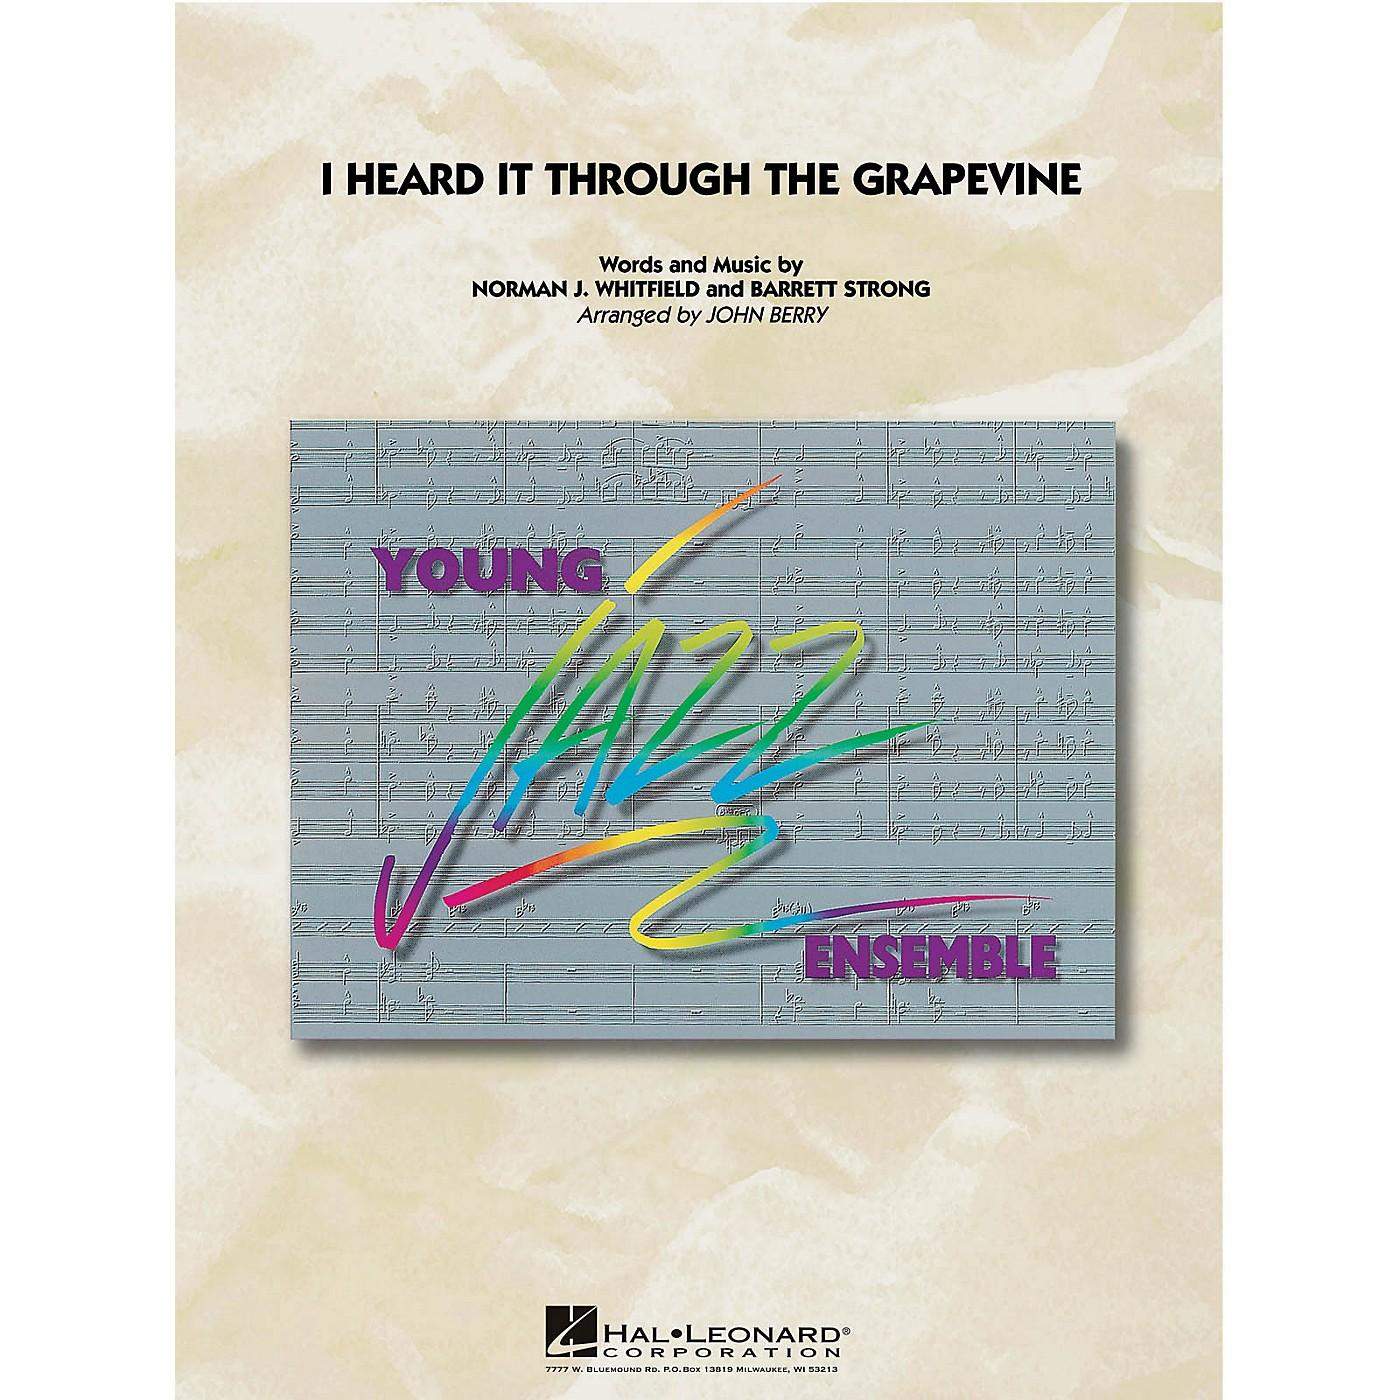 Hal Leonard I Heard It Through the Grapevine Jazz Band Level 3 by Marvin Gaye Arranged by John Berry thumbnail